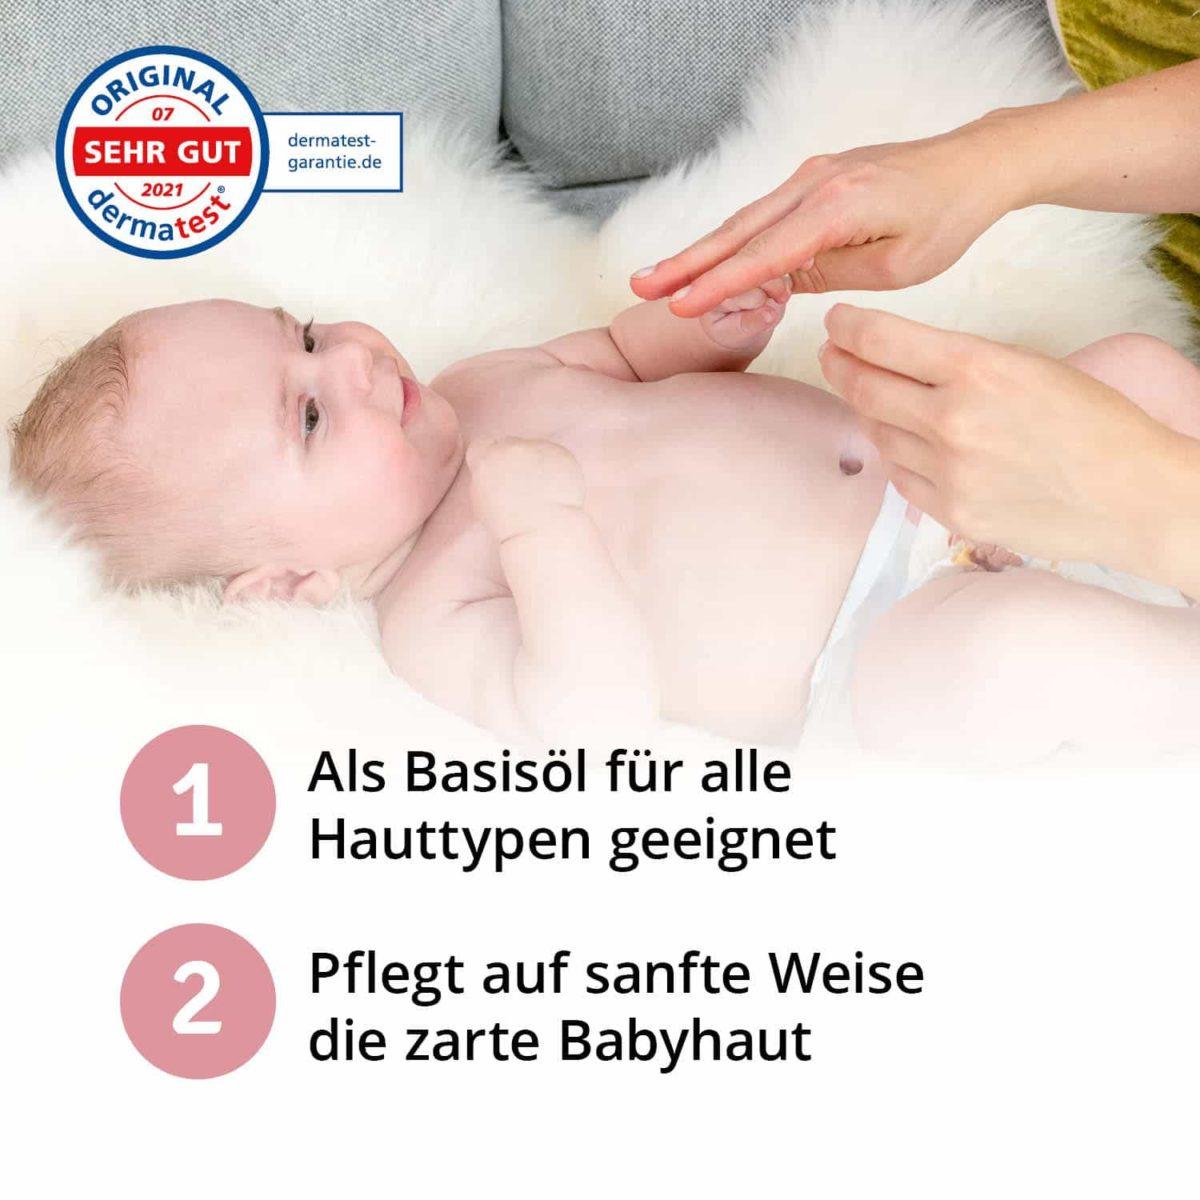 Casida Mandelöl Haut & Haare – 200 ml 16813099 PZN Apotheke Mandelöl Babypflege trockene Haut pflegen natürlich6